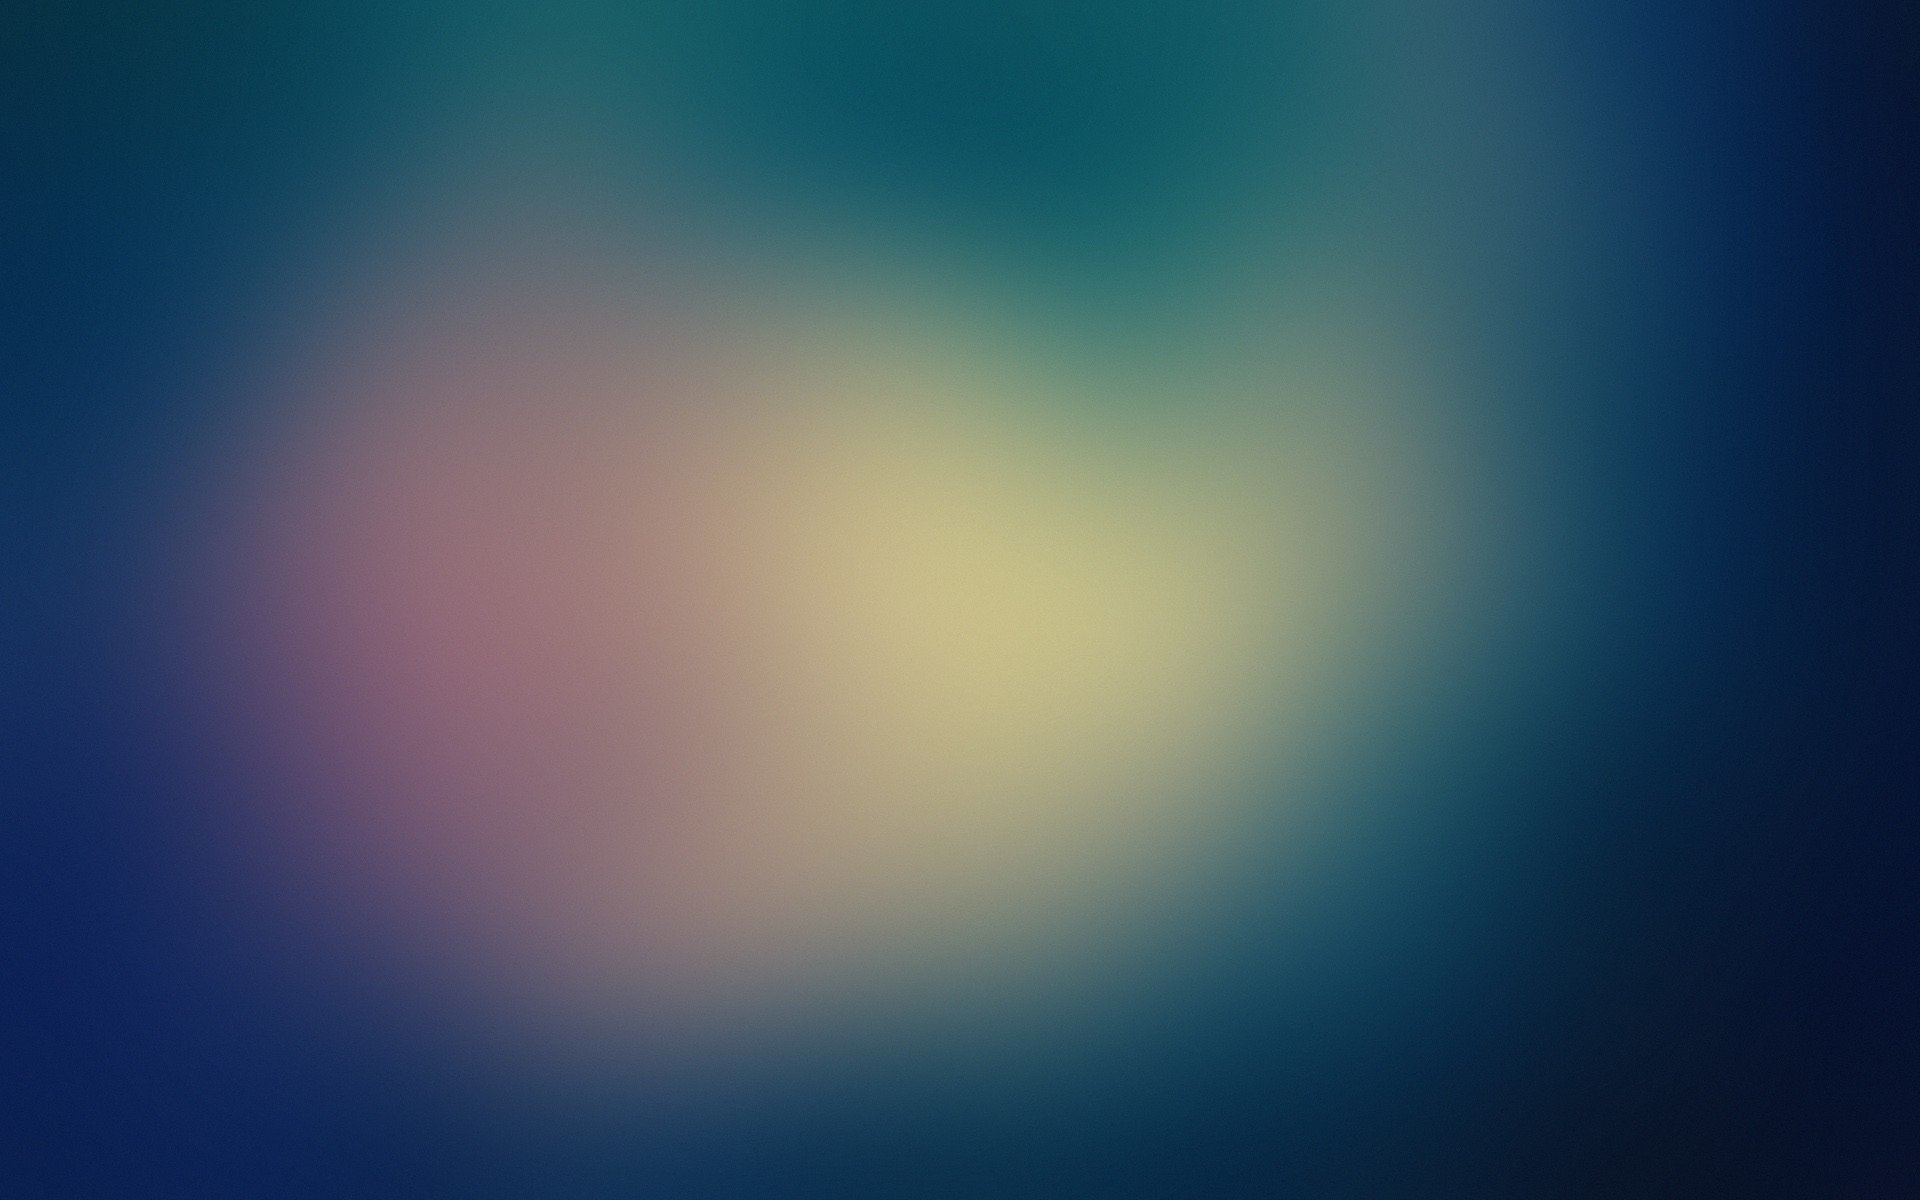 minimalistic multicolor backgrounds blurred - photo #11